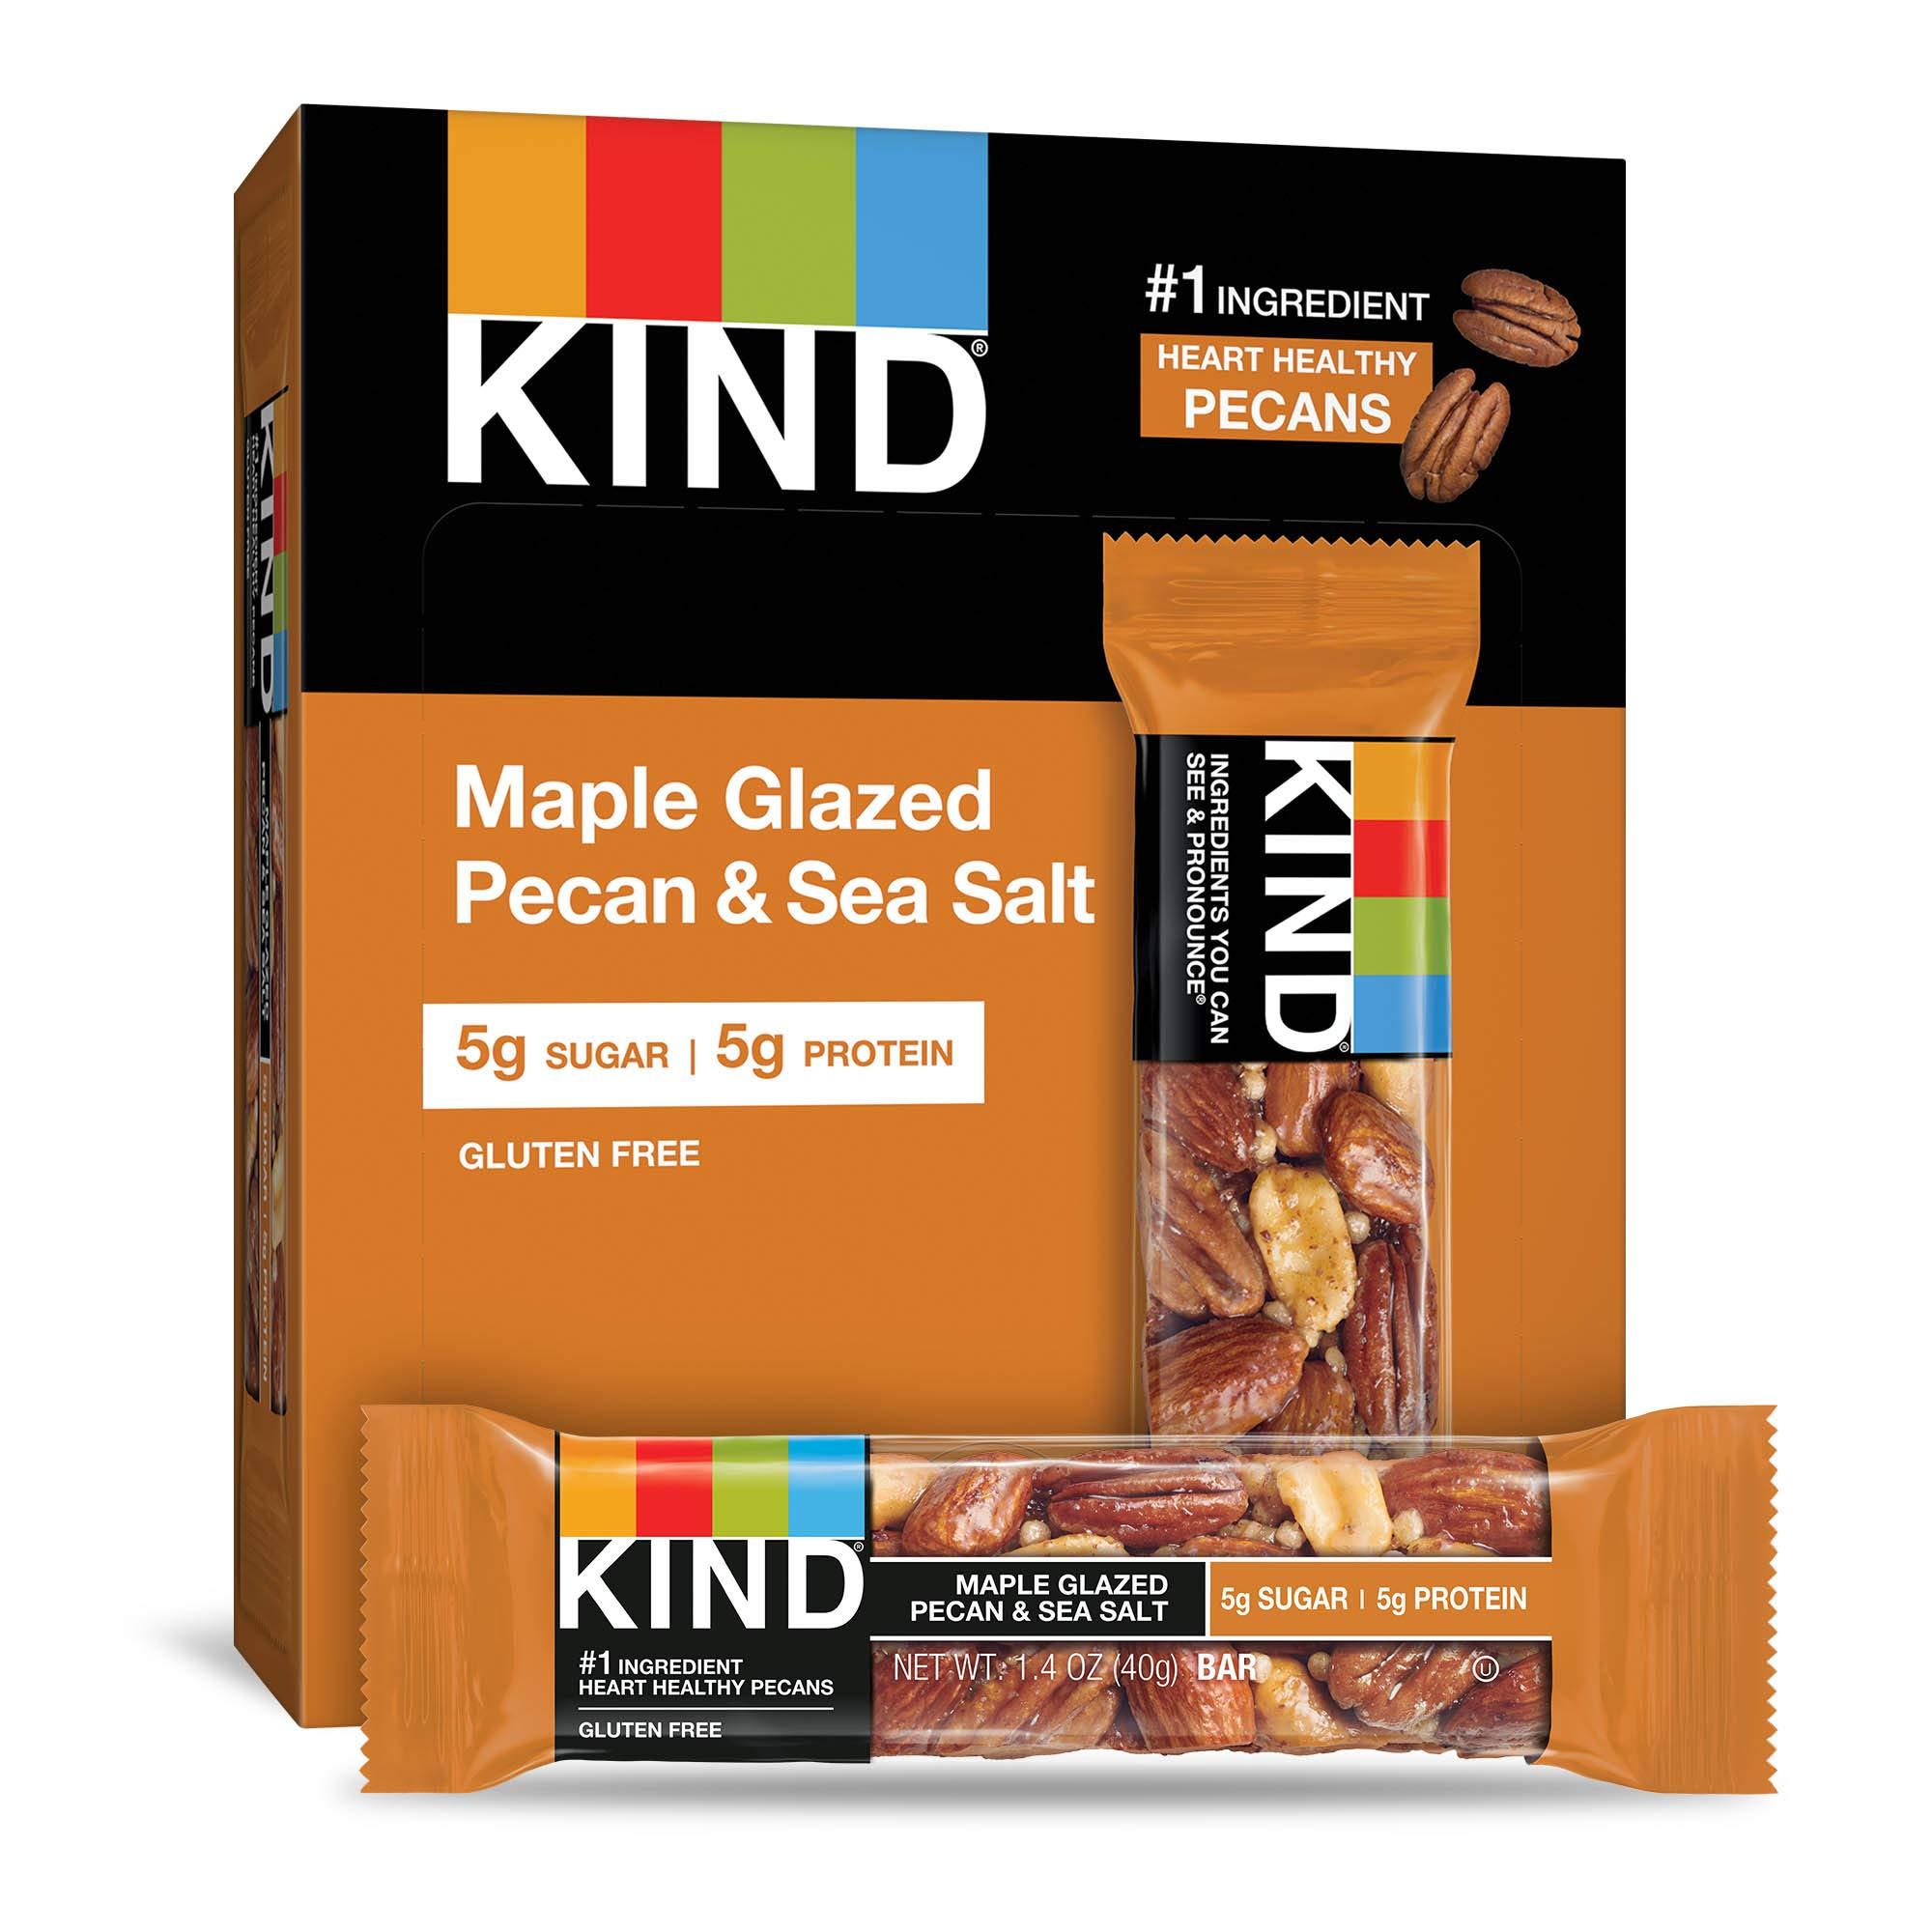 KIND Bars, Maple Glazed Pecan & Sea Salt, Gluten Free, Low Sugar, 48 Count by KIND